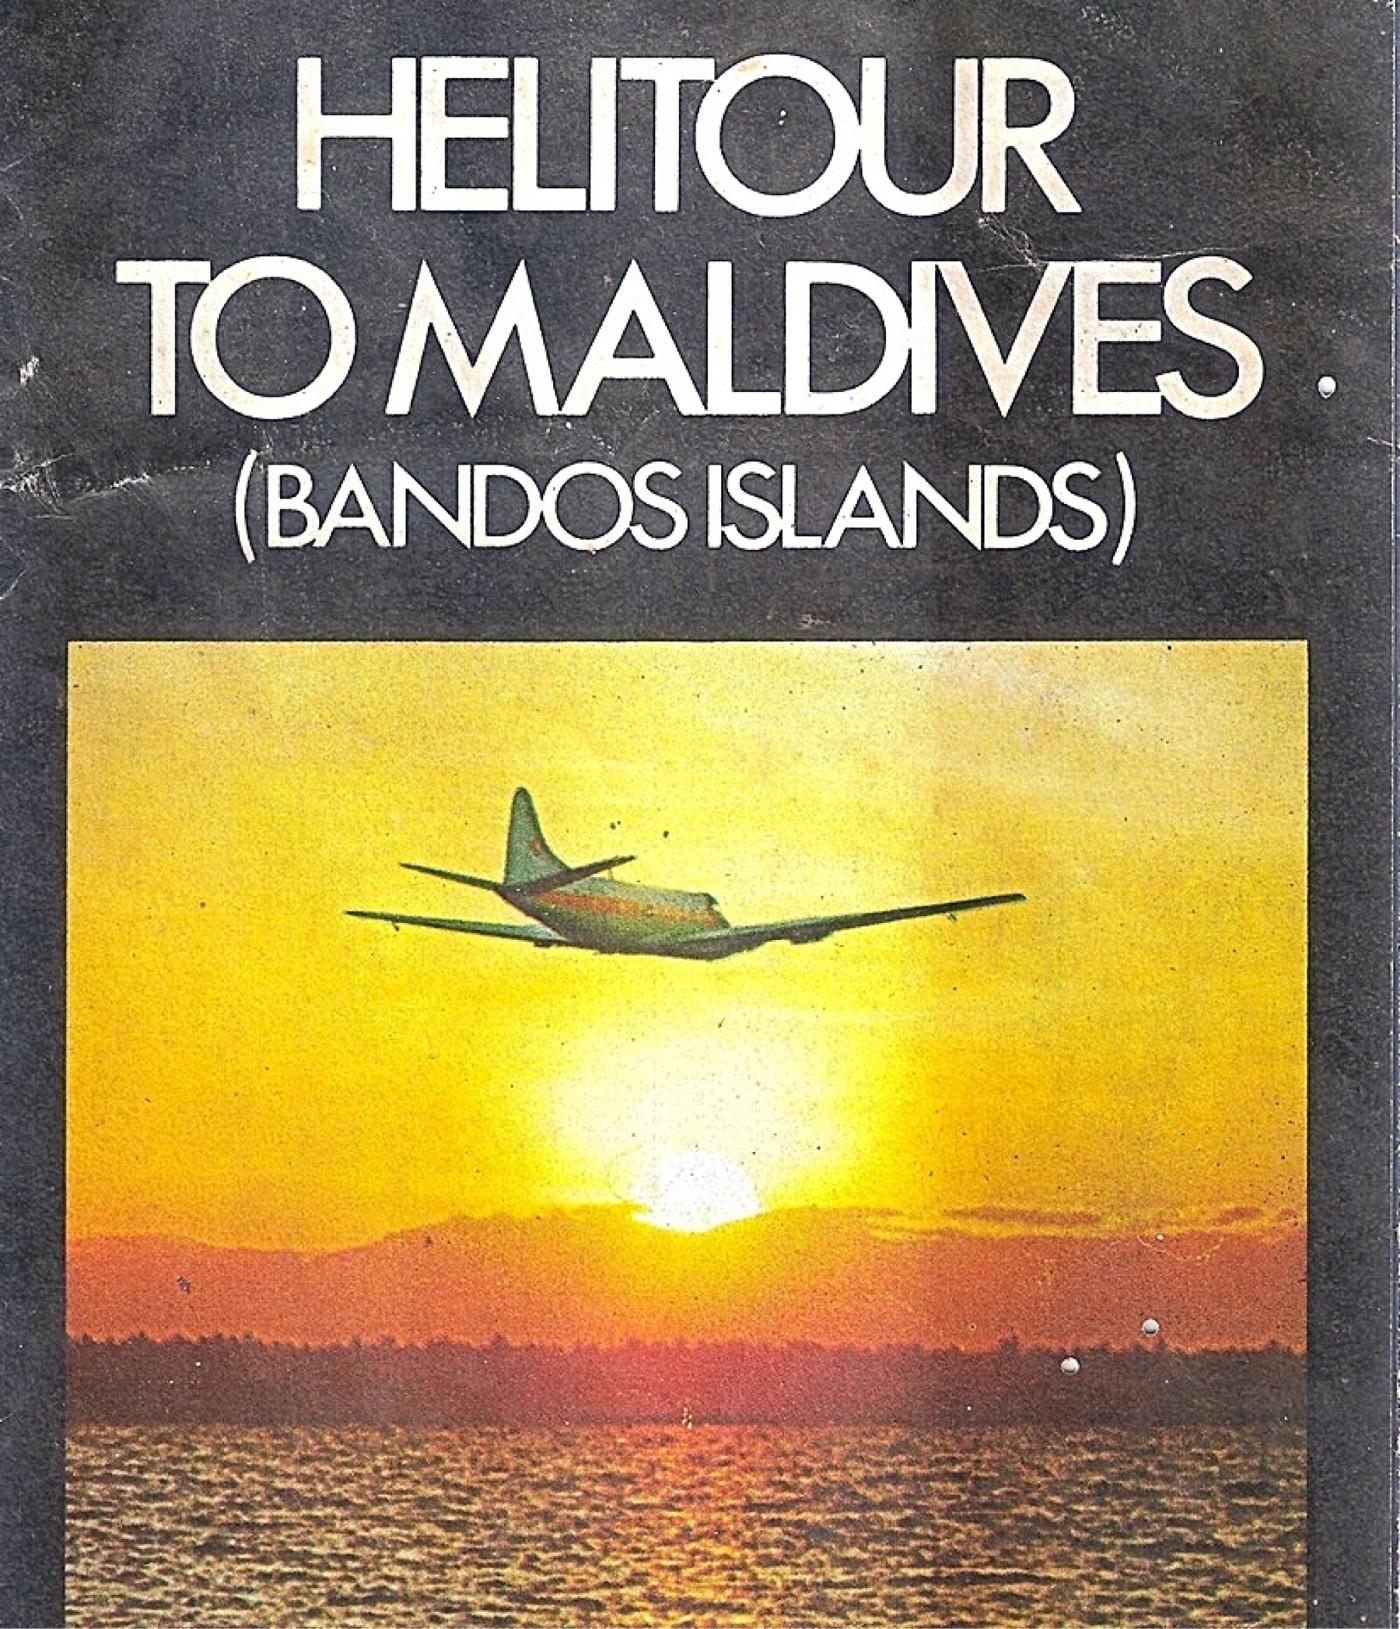 A Helitours ad — courtesy Capt Noel Lokuge